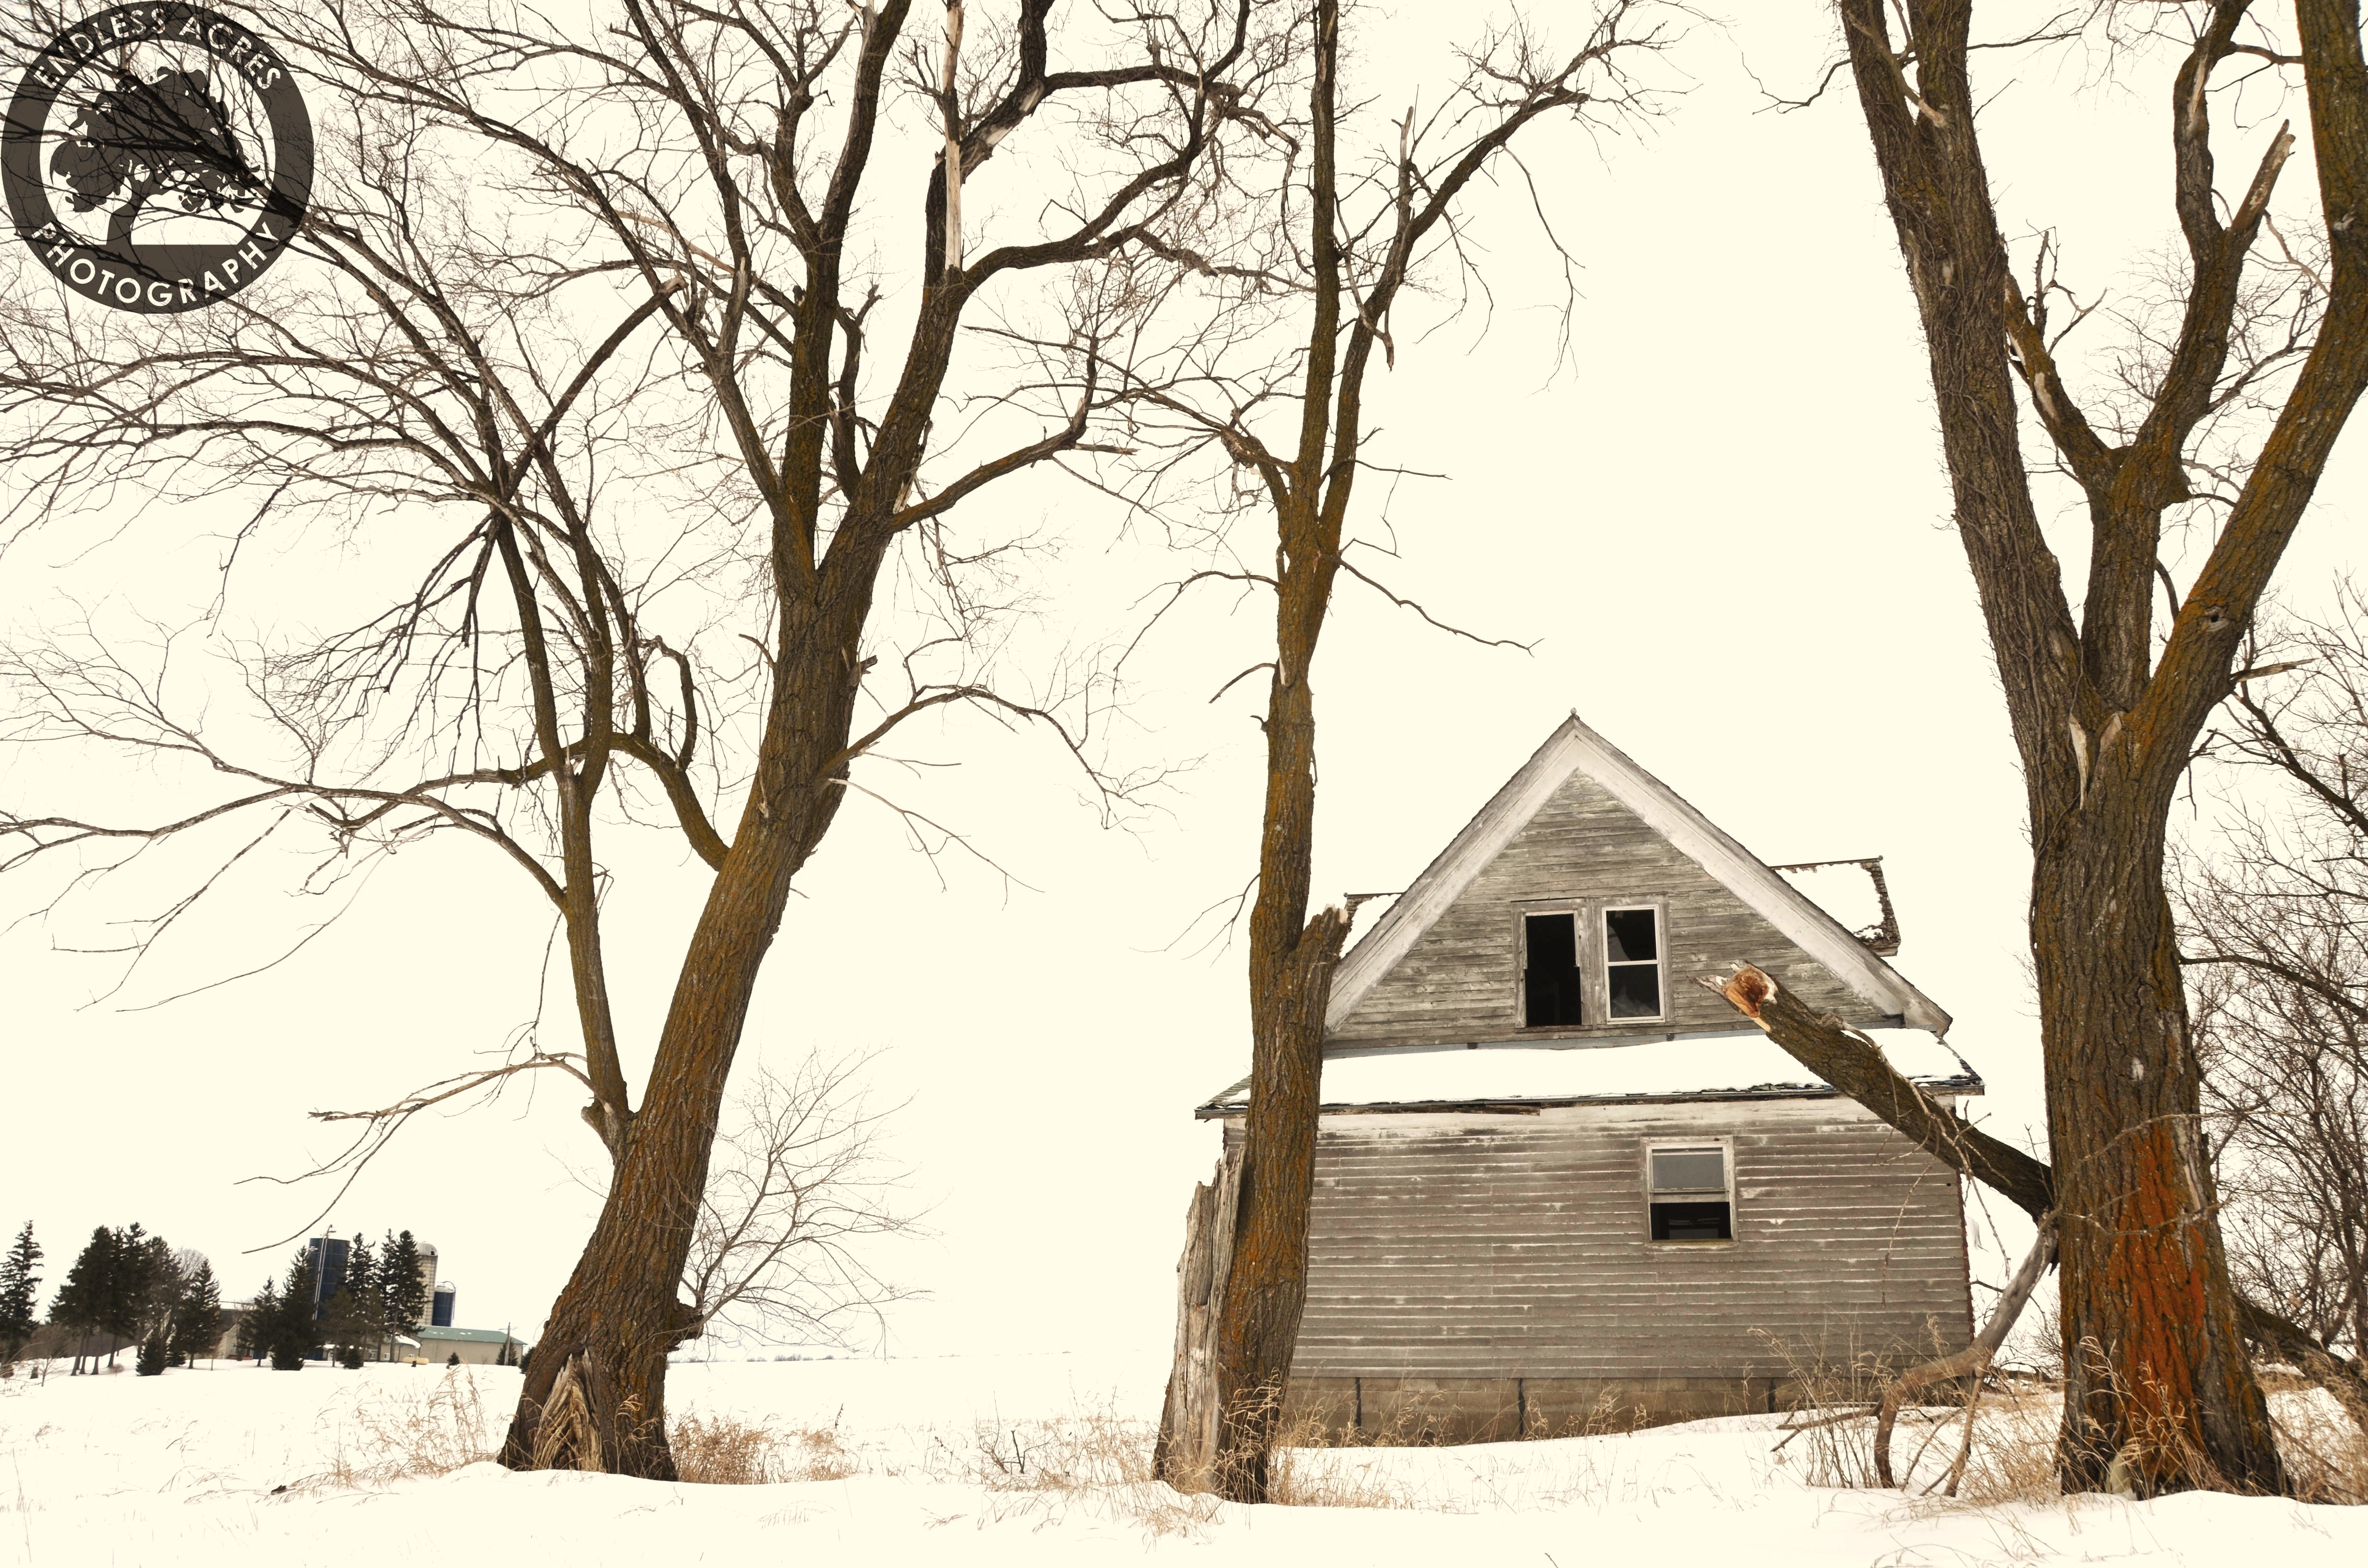 www.endlessphotoadventures.com